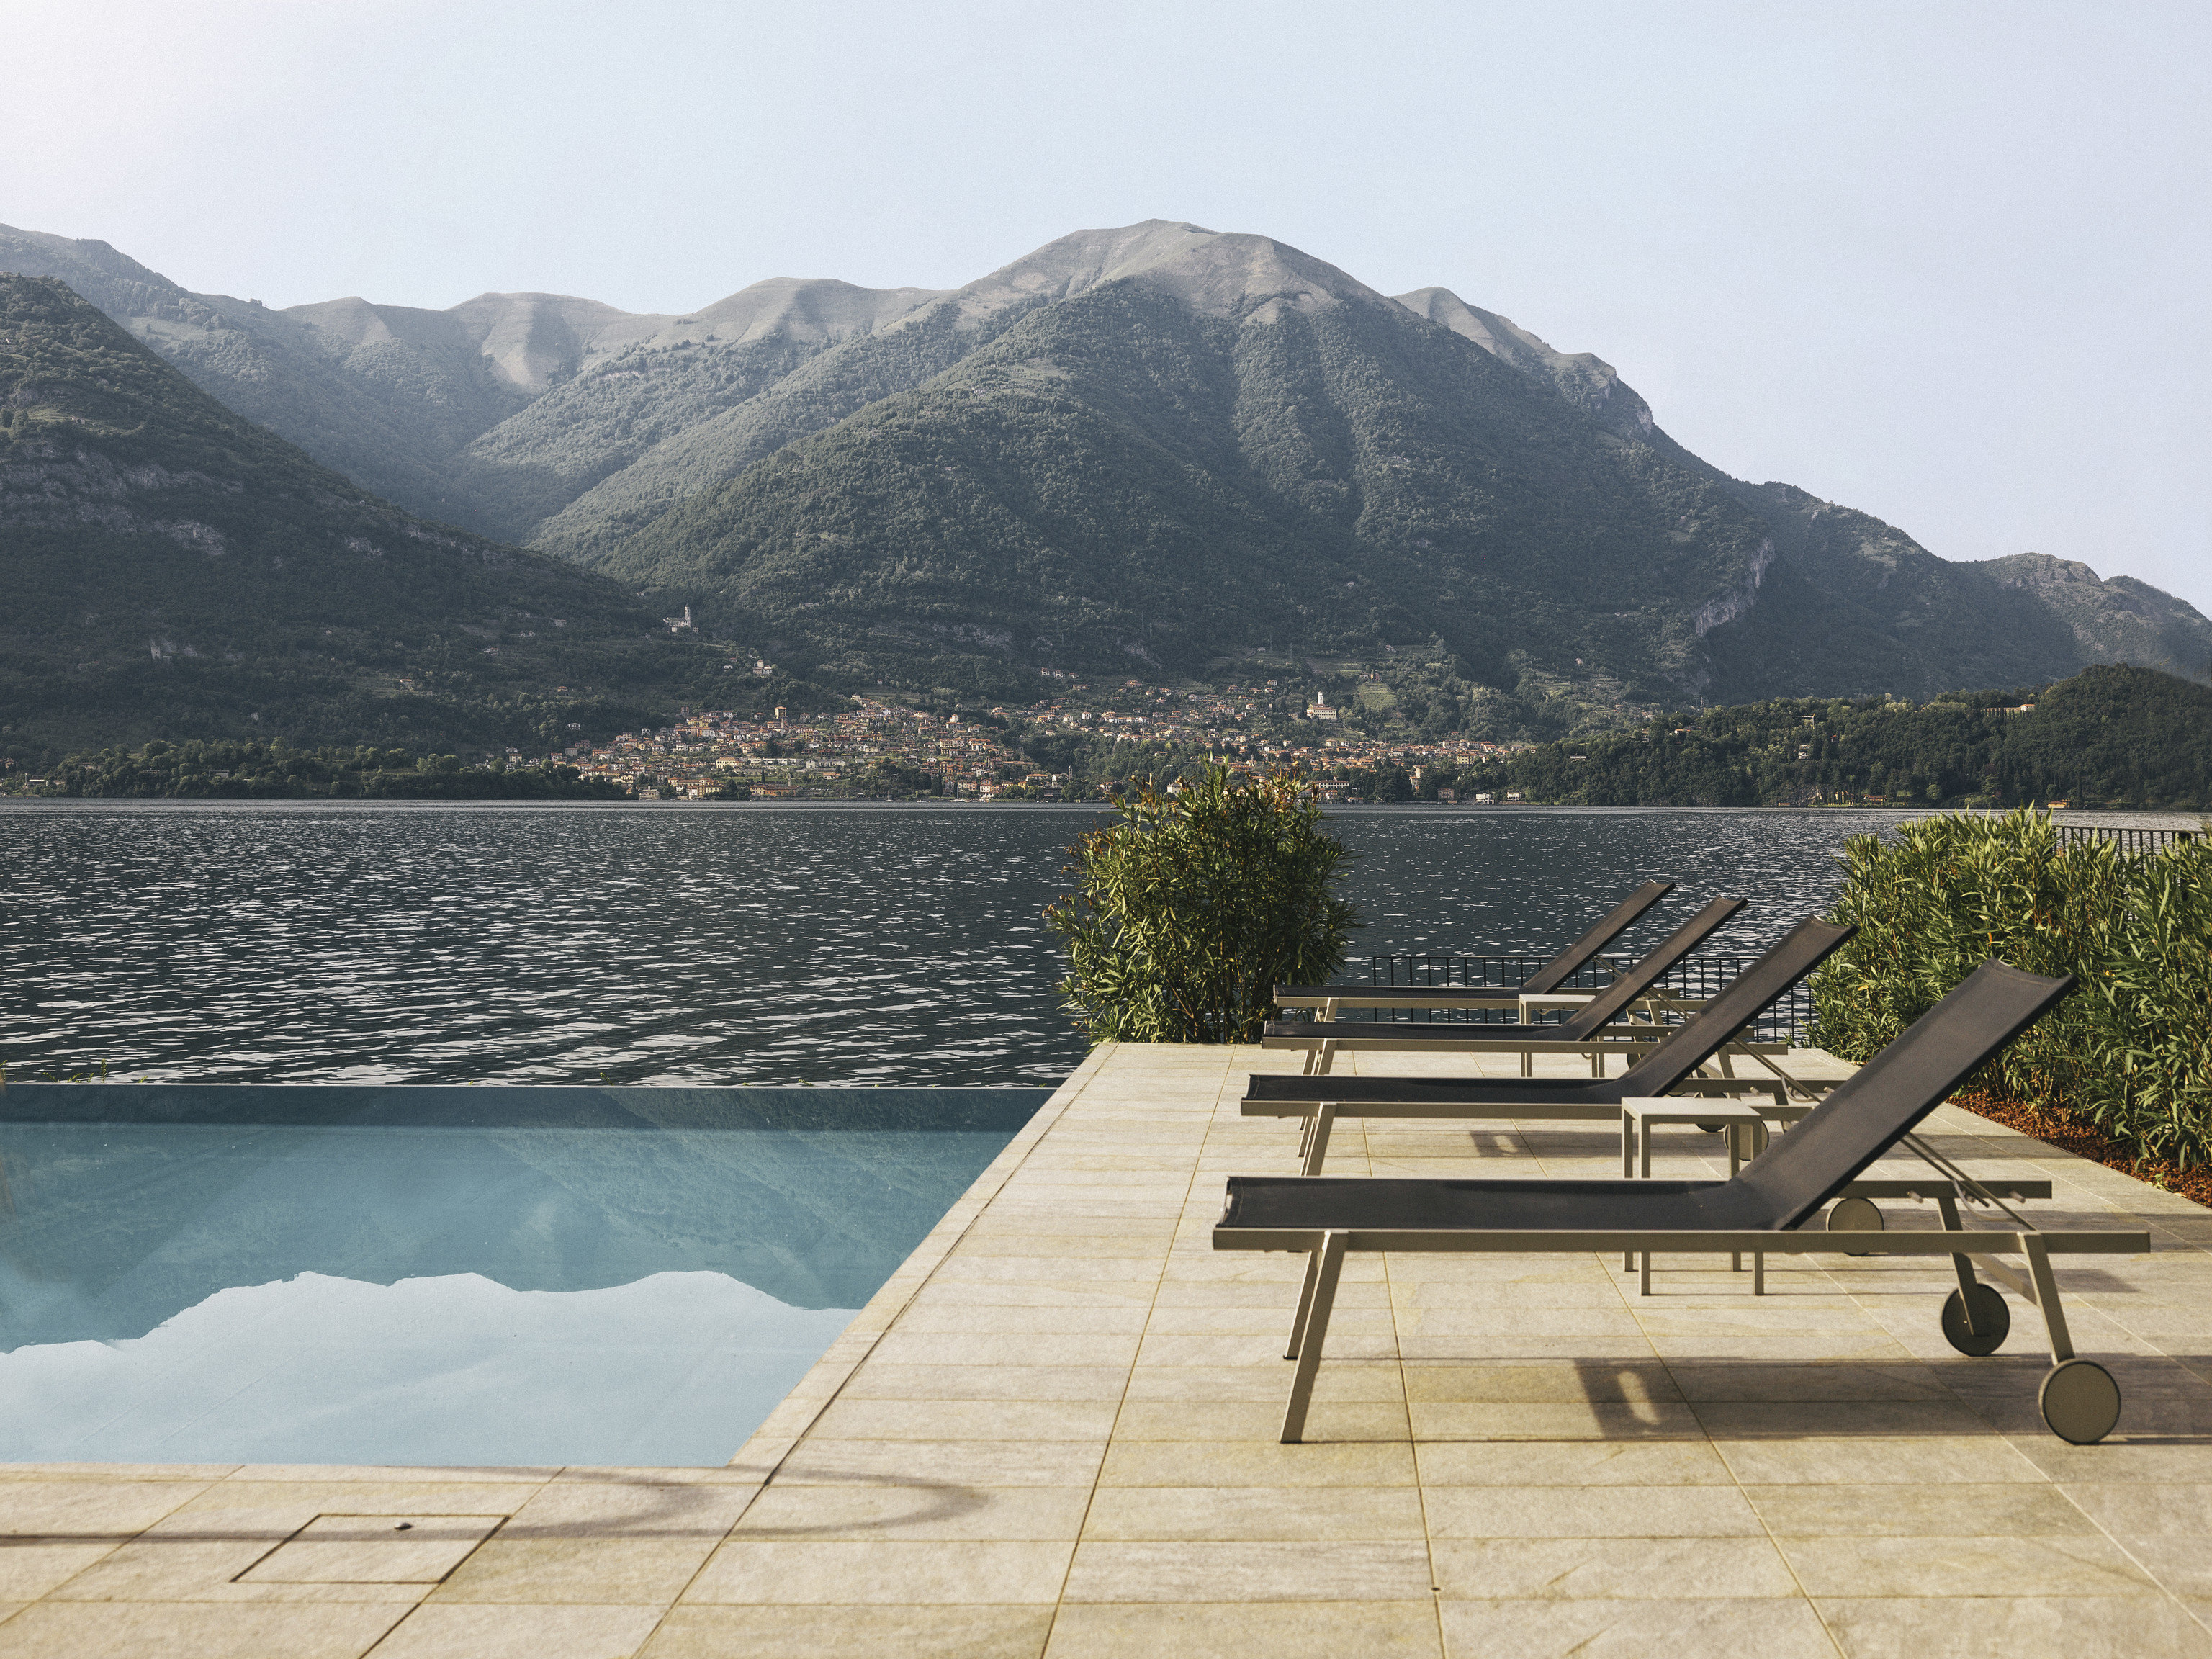 Romance Trip Ideas mountain sky outdoor Lake Sea vacation shore Nature bay Coast reservoir overlooking cement